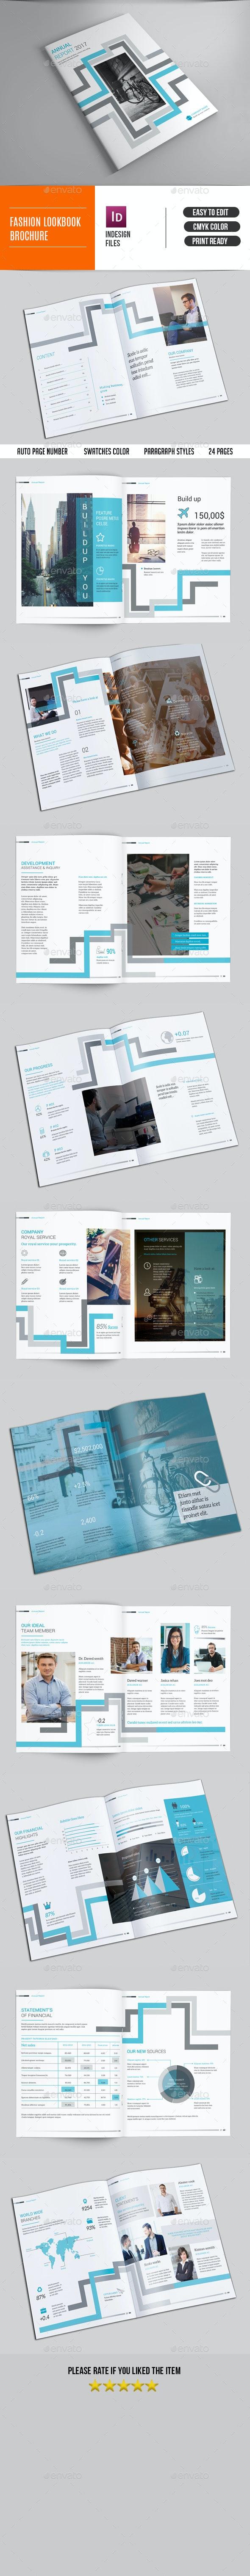 Annual Report Brochure-V412 - Corporate Brochures